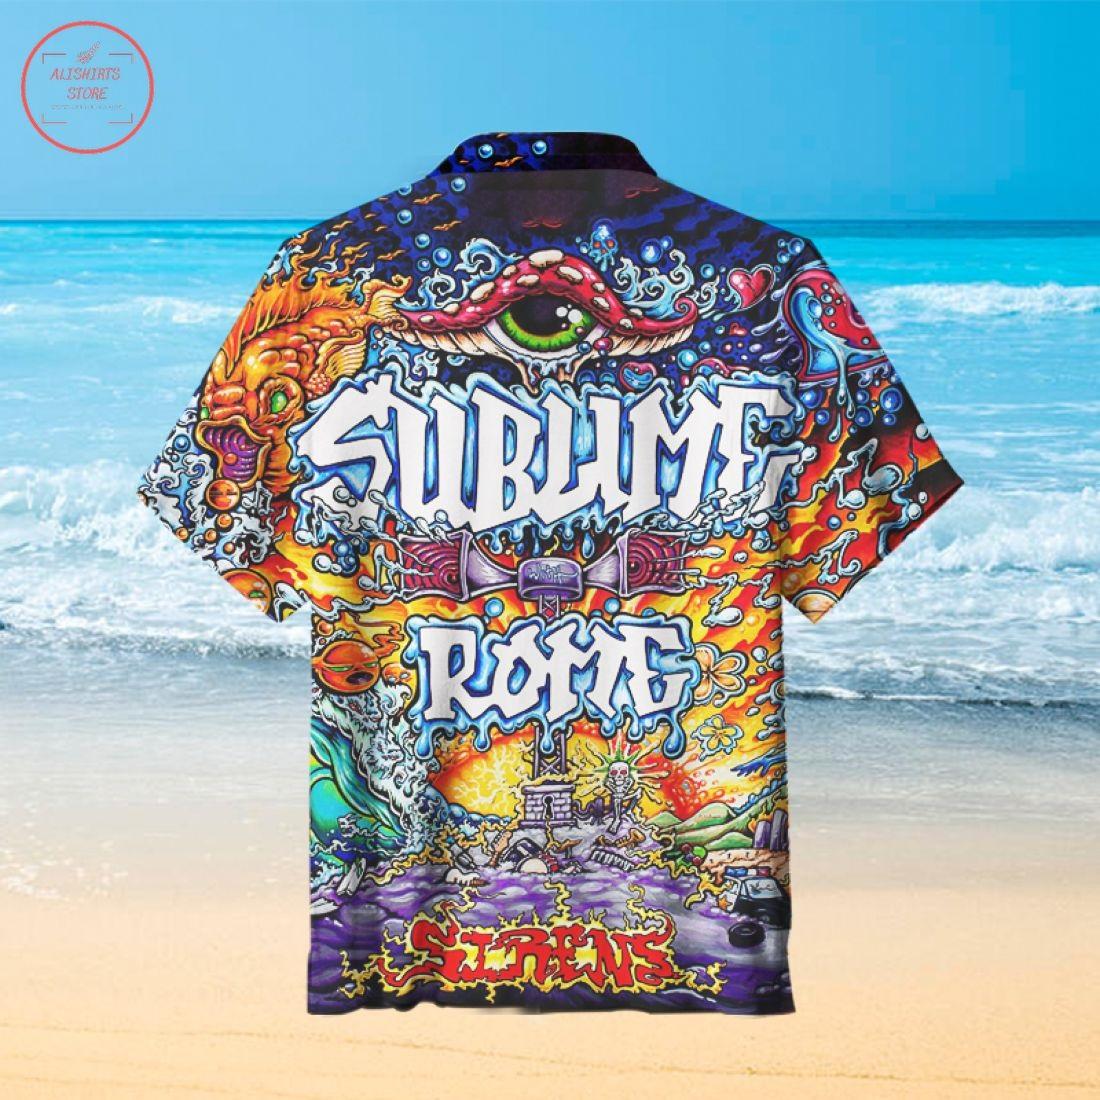 Sublime with Rome Hawaiian Shirt